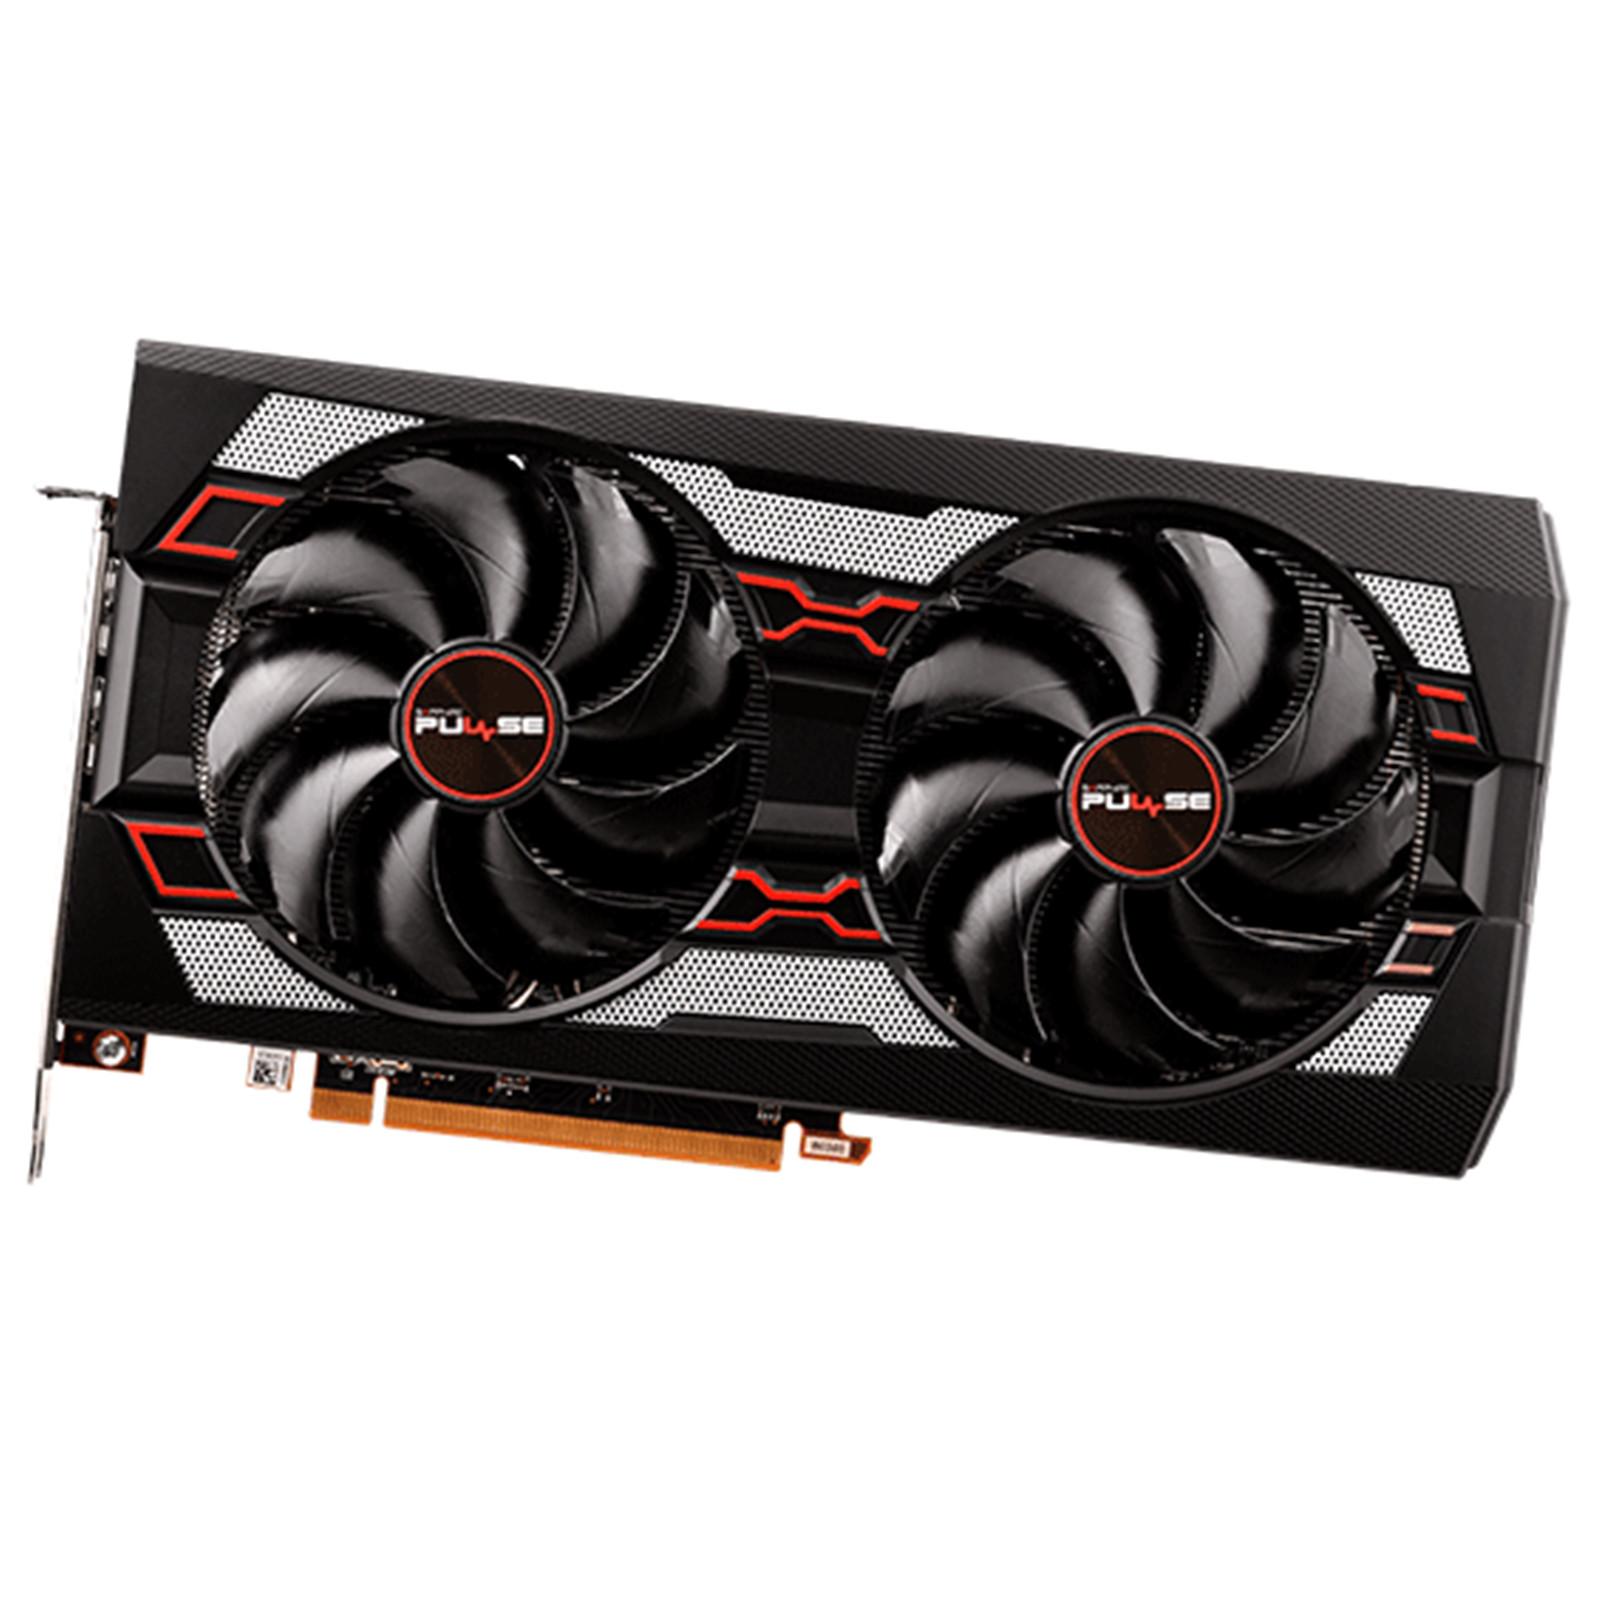 Buy the Sapphire PULSE Radeon RX 5700XT 8GB GDDR6 Graphics